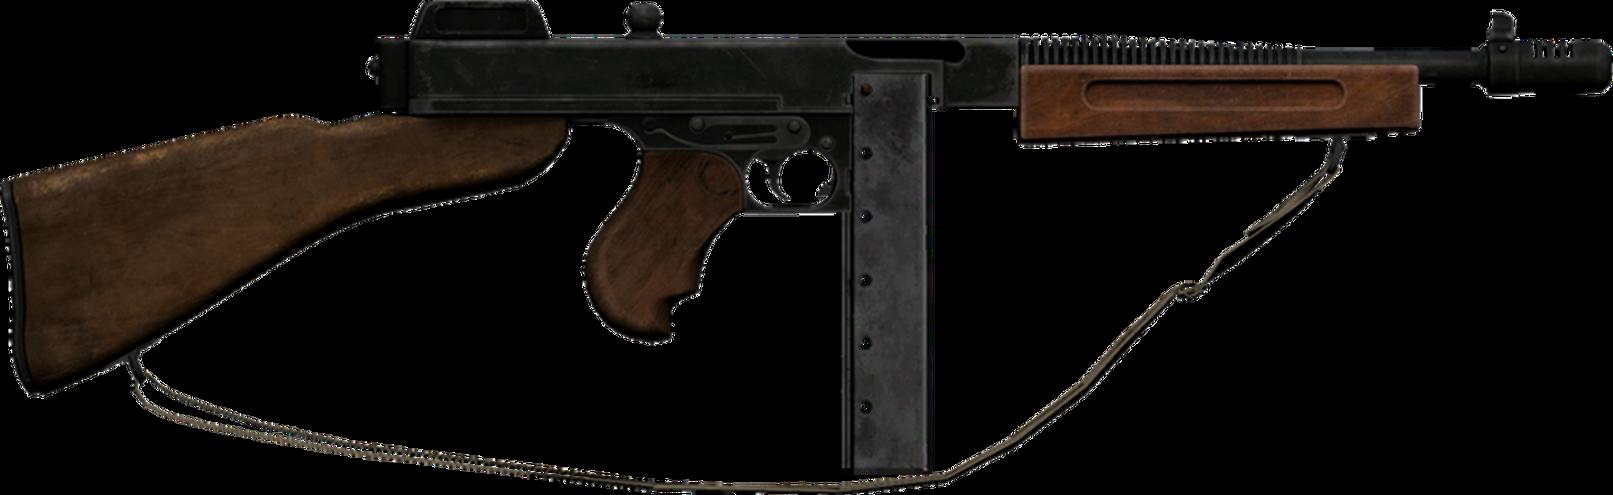 M1928A1 Thompson Arma 3